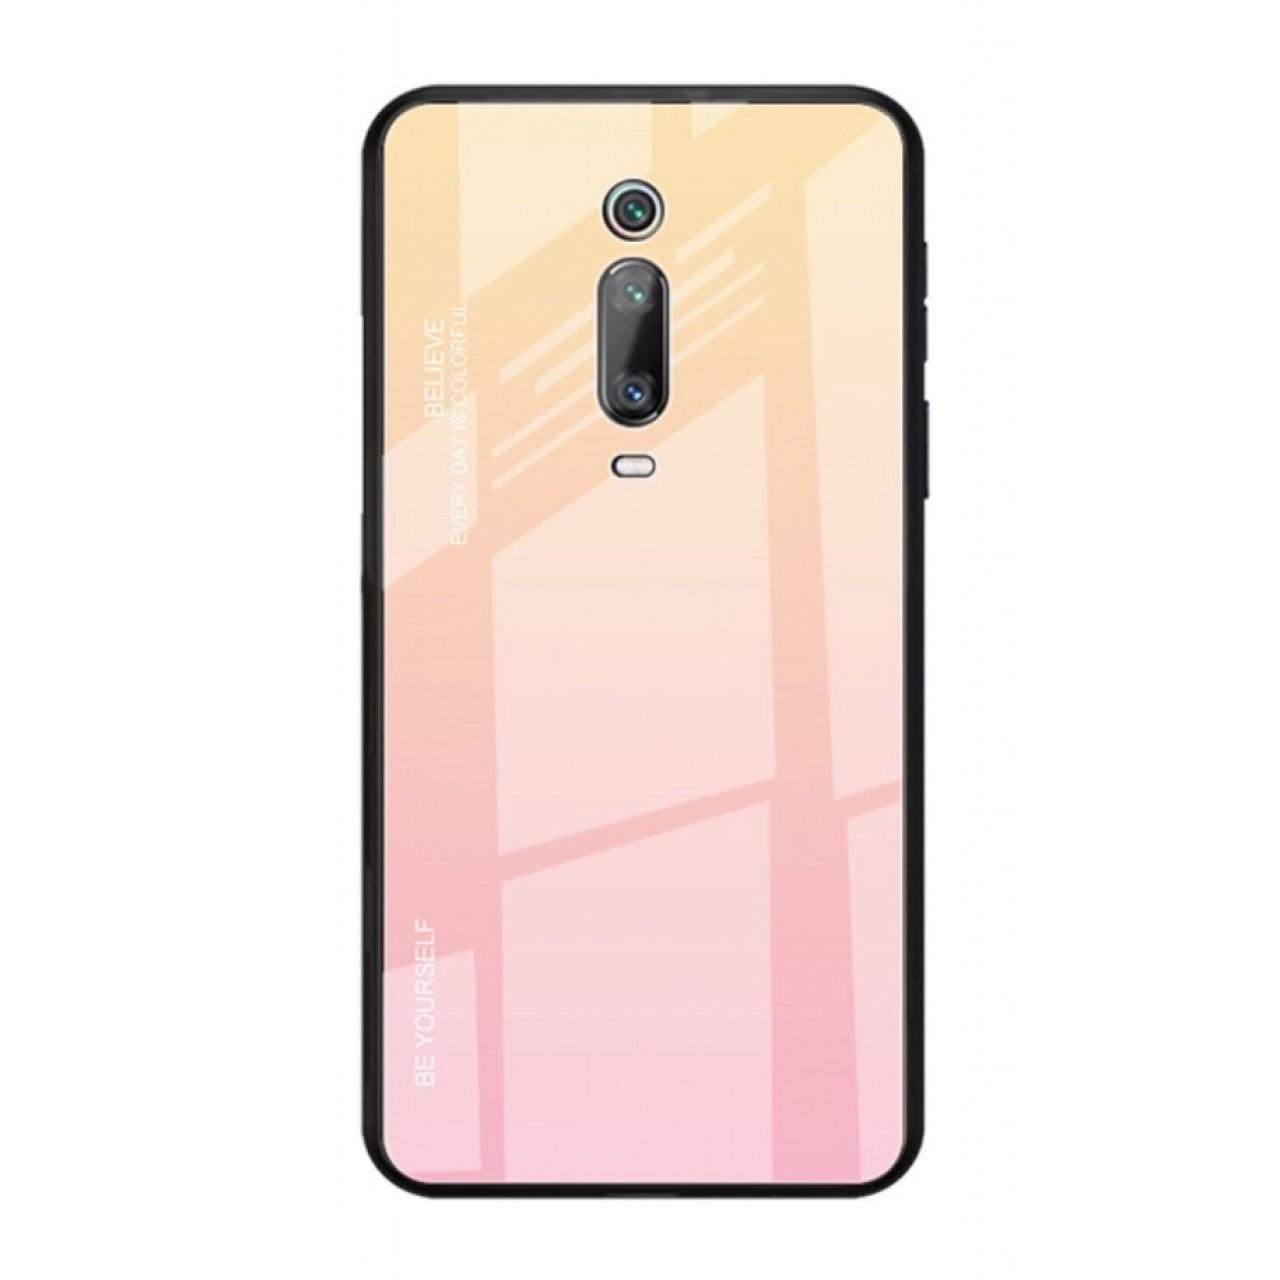 Luxury Hybrid 9H Glass Case For Xiaomi Mi 9T / Mi 9T PRO - Yellow